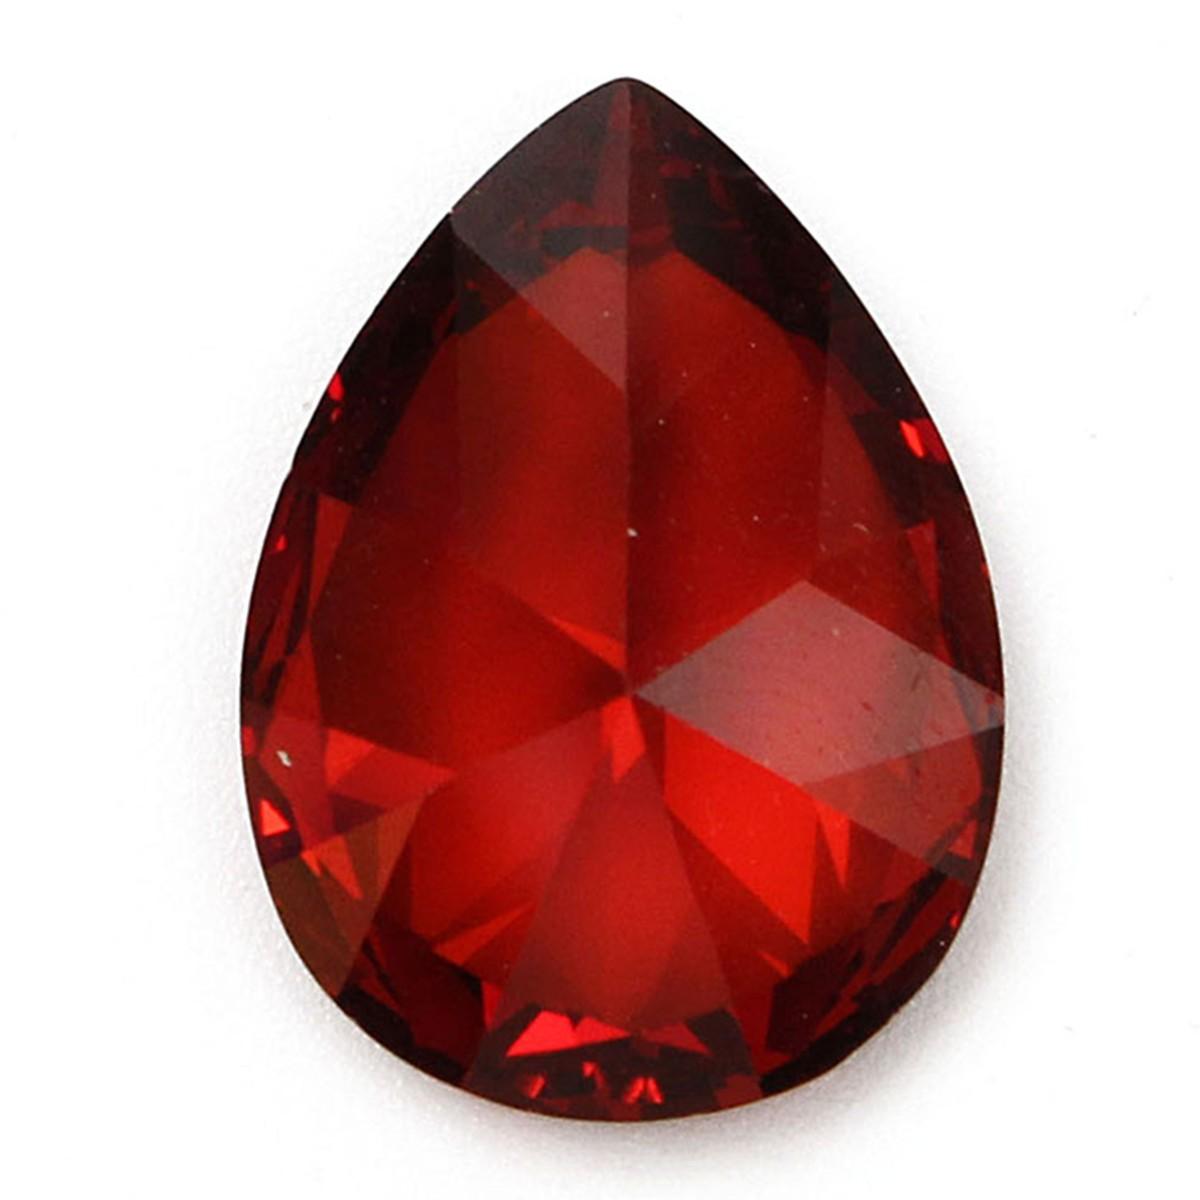 13x18mm Red Gemstone Loose Gem DIY Findings Setting ...